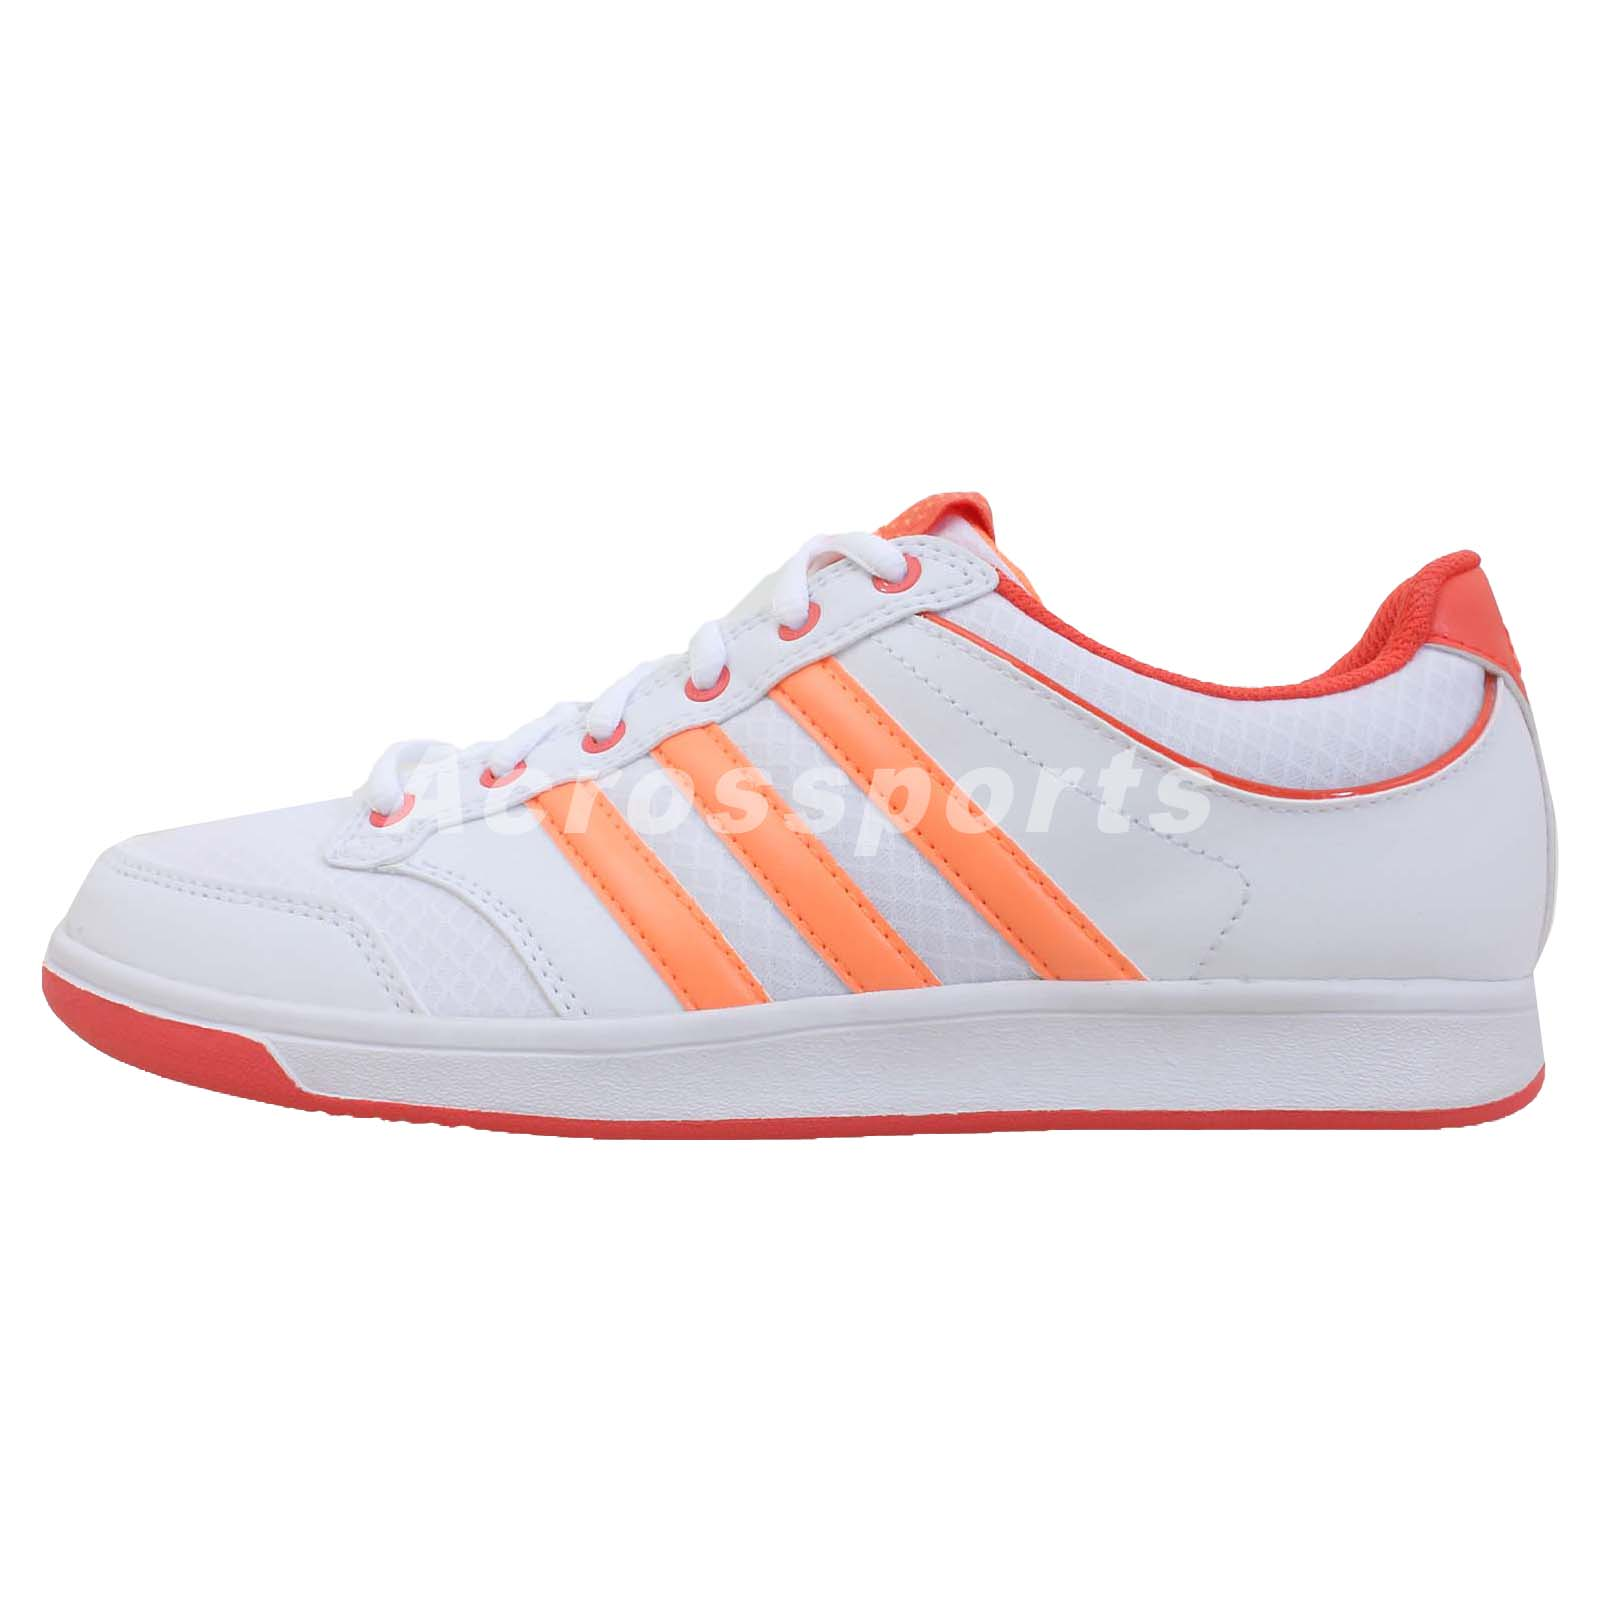 adidas bian 3 w white orange 2014 womens tennis shoes